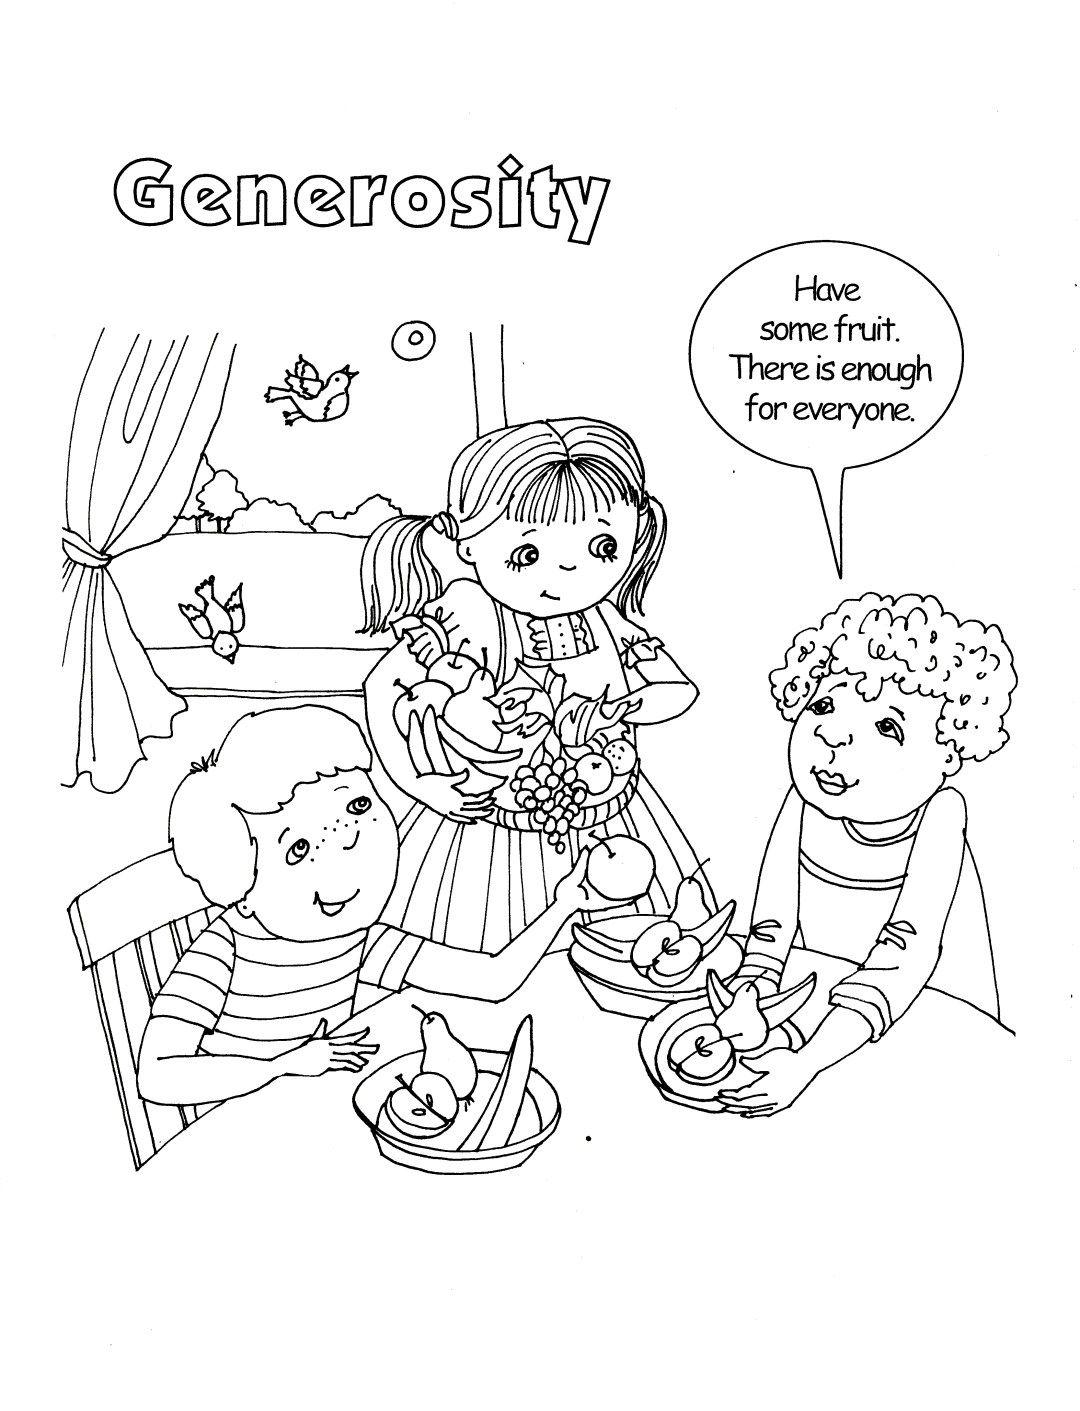 Generosity Coloring Sheet Sunday School Crafts School Crafts